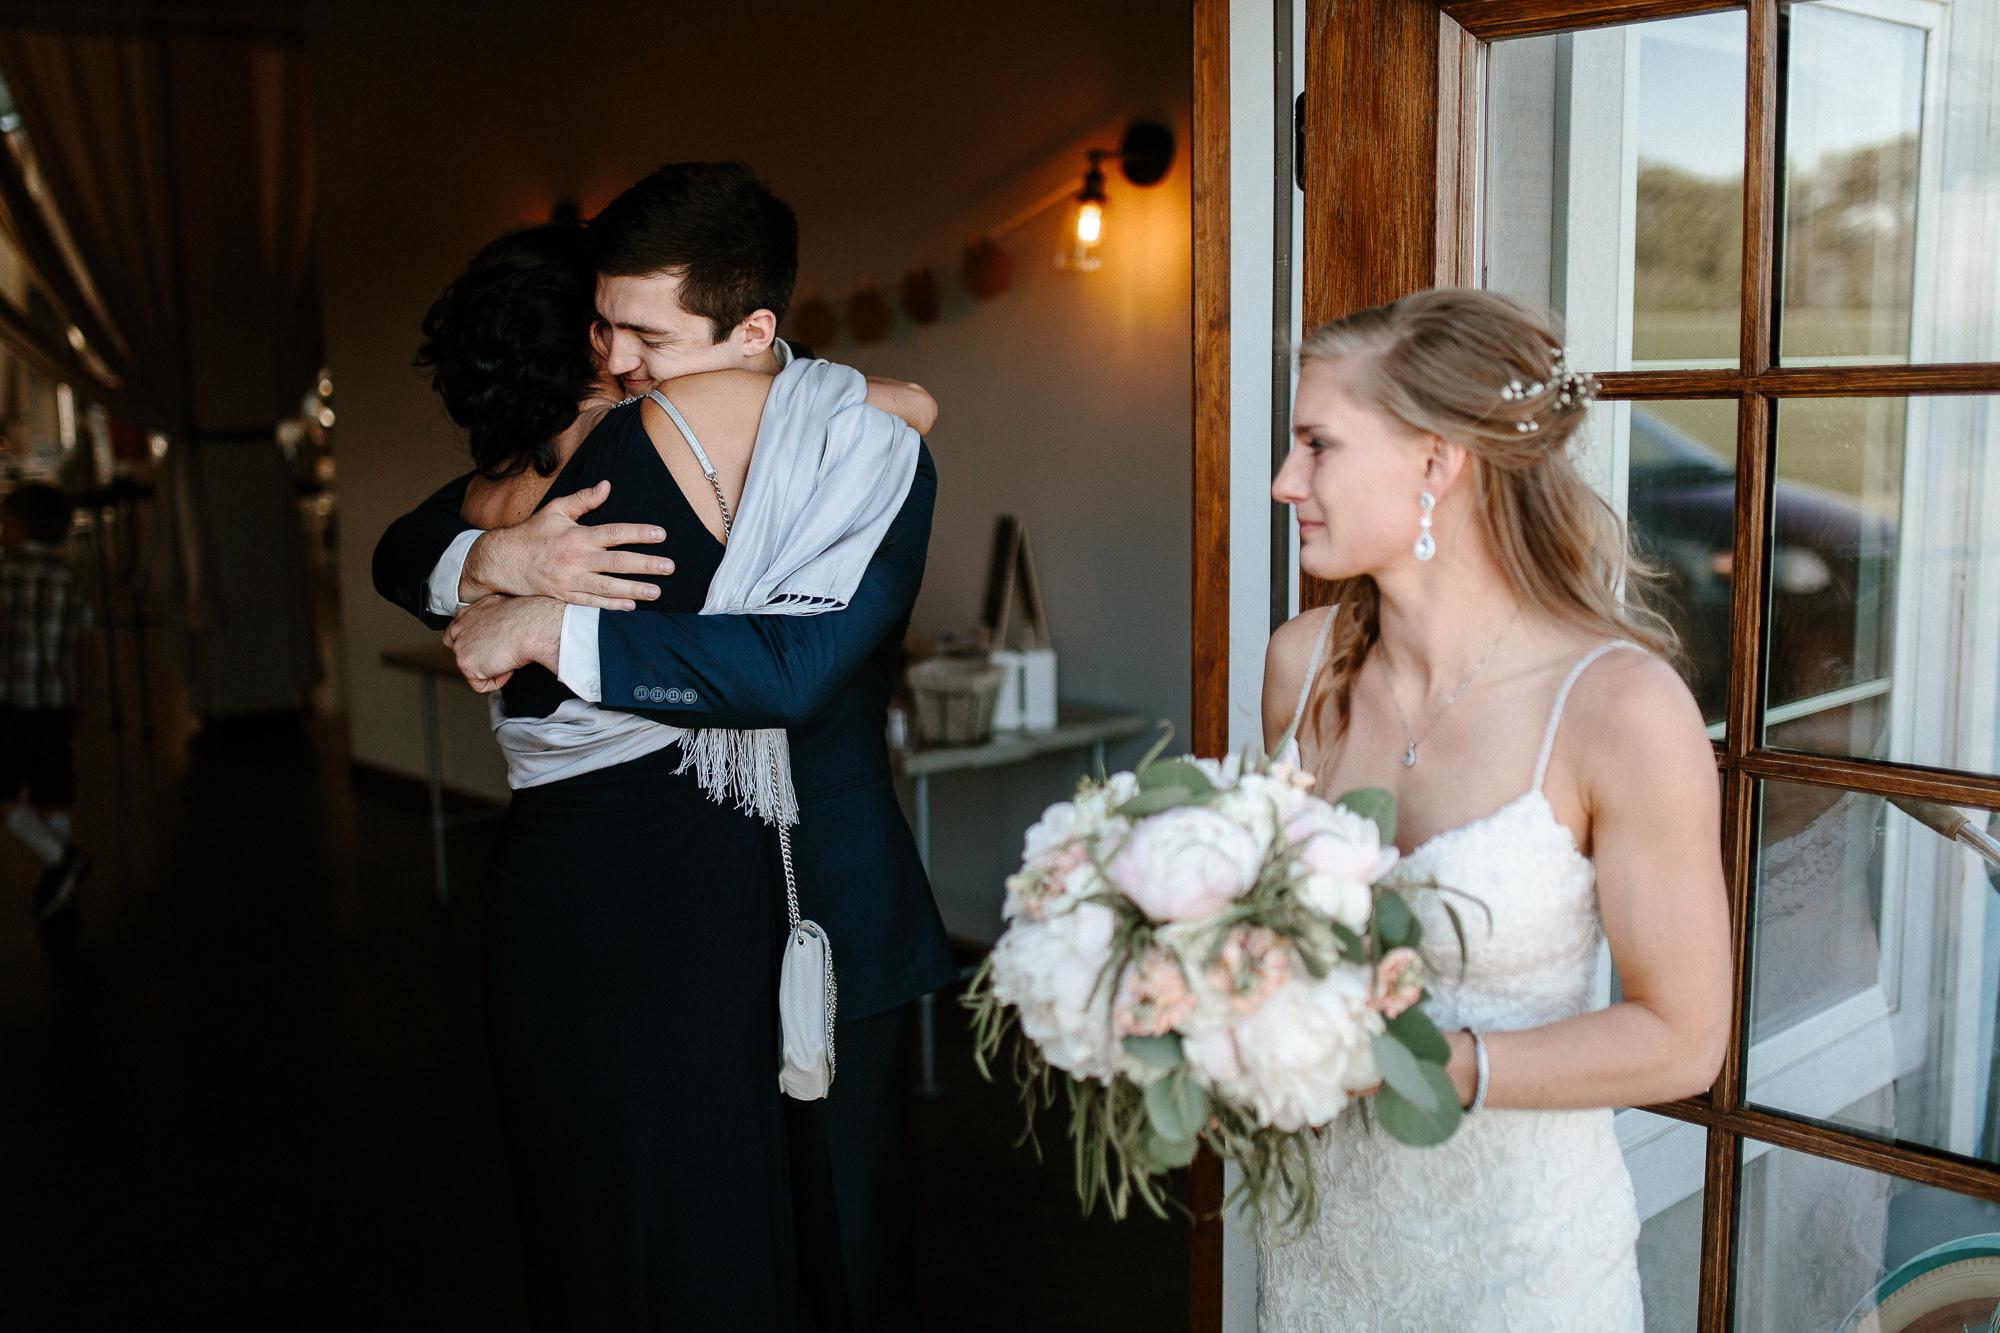 wedding-elopement-adventerous-romantic-timeless-south-dakota-blue-haven-barn-066.jpg